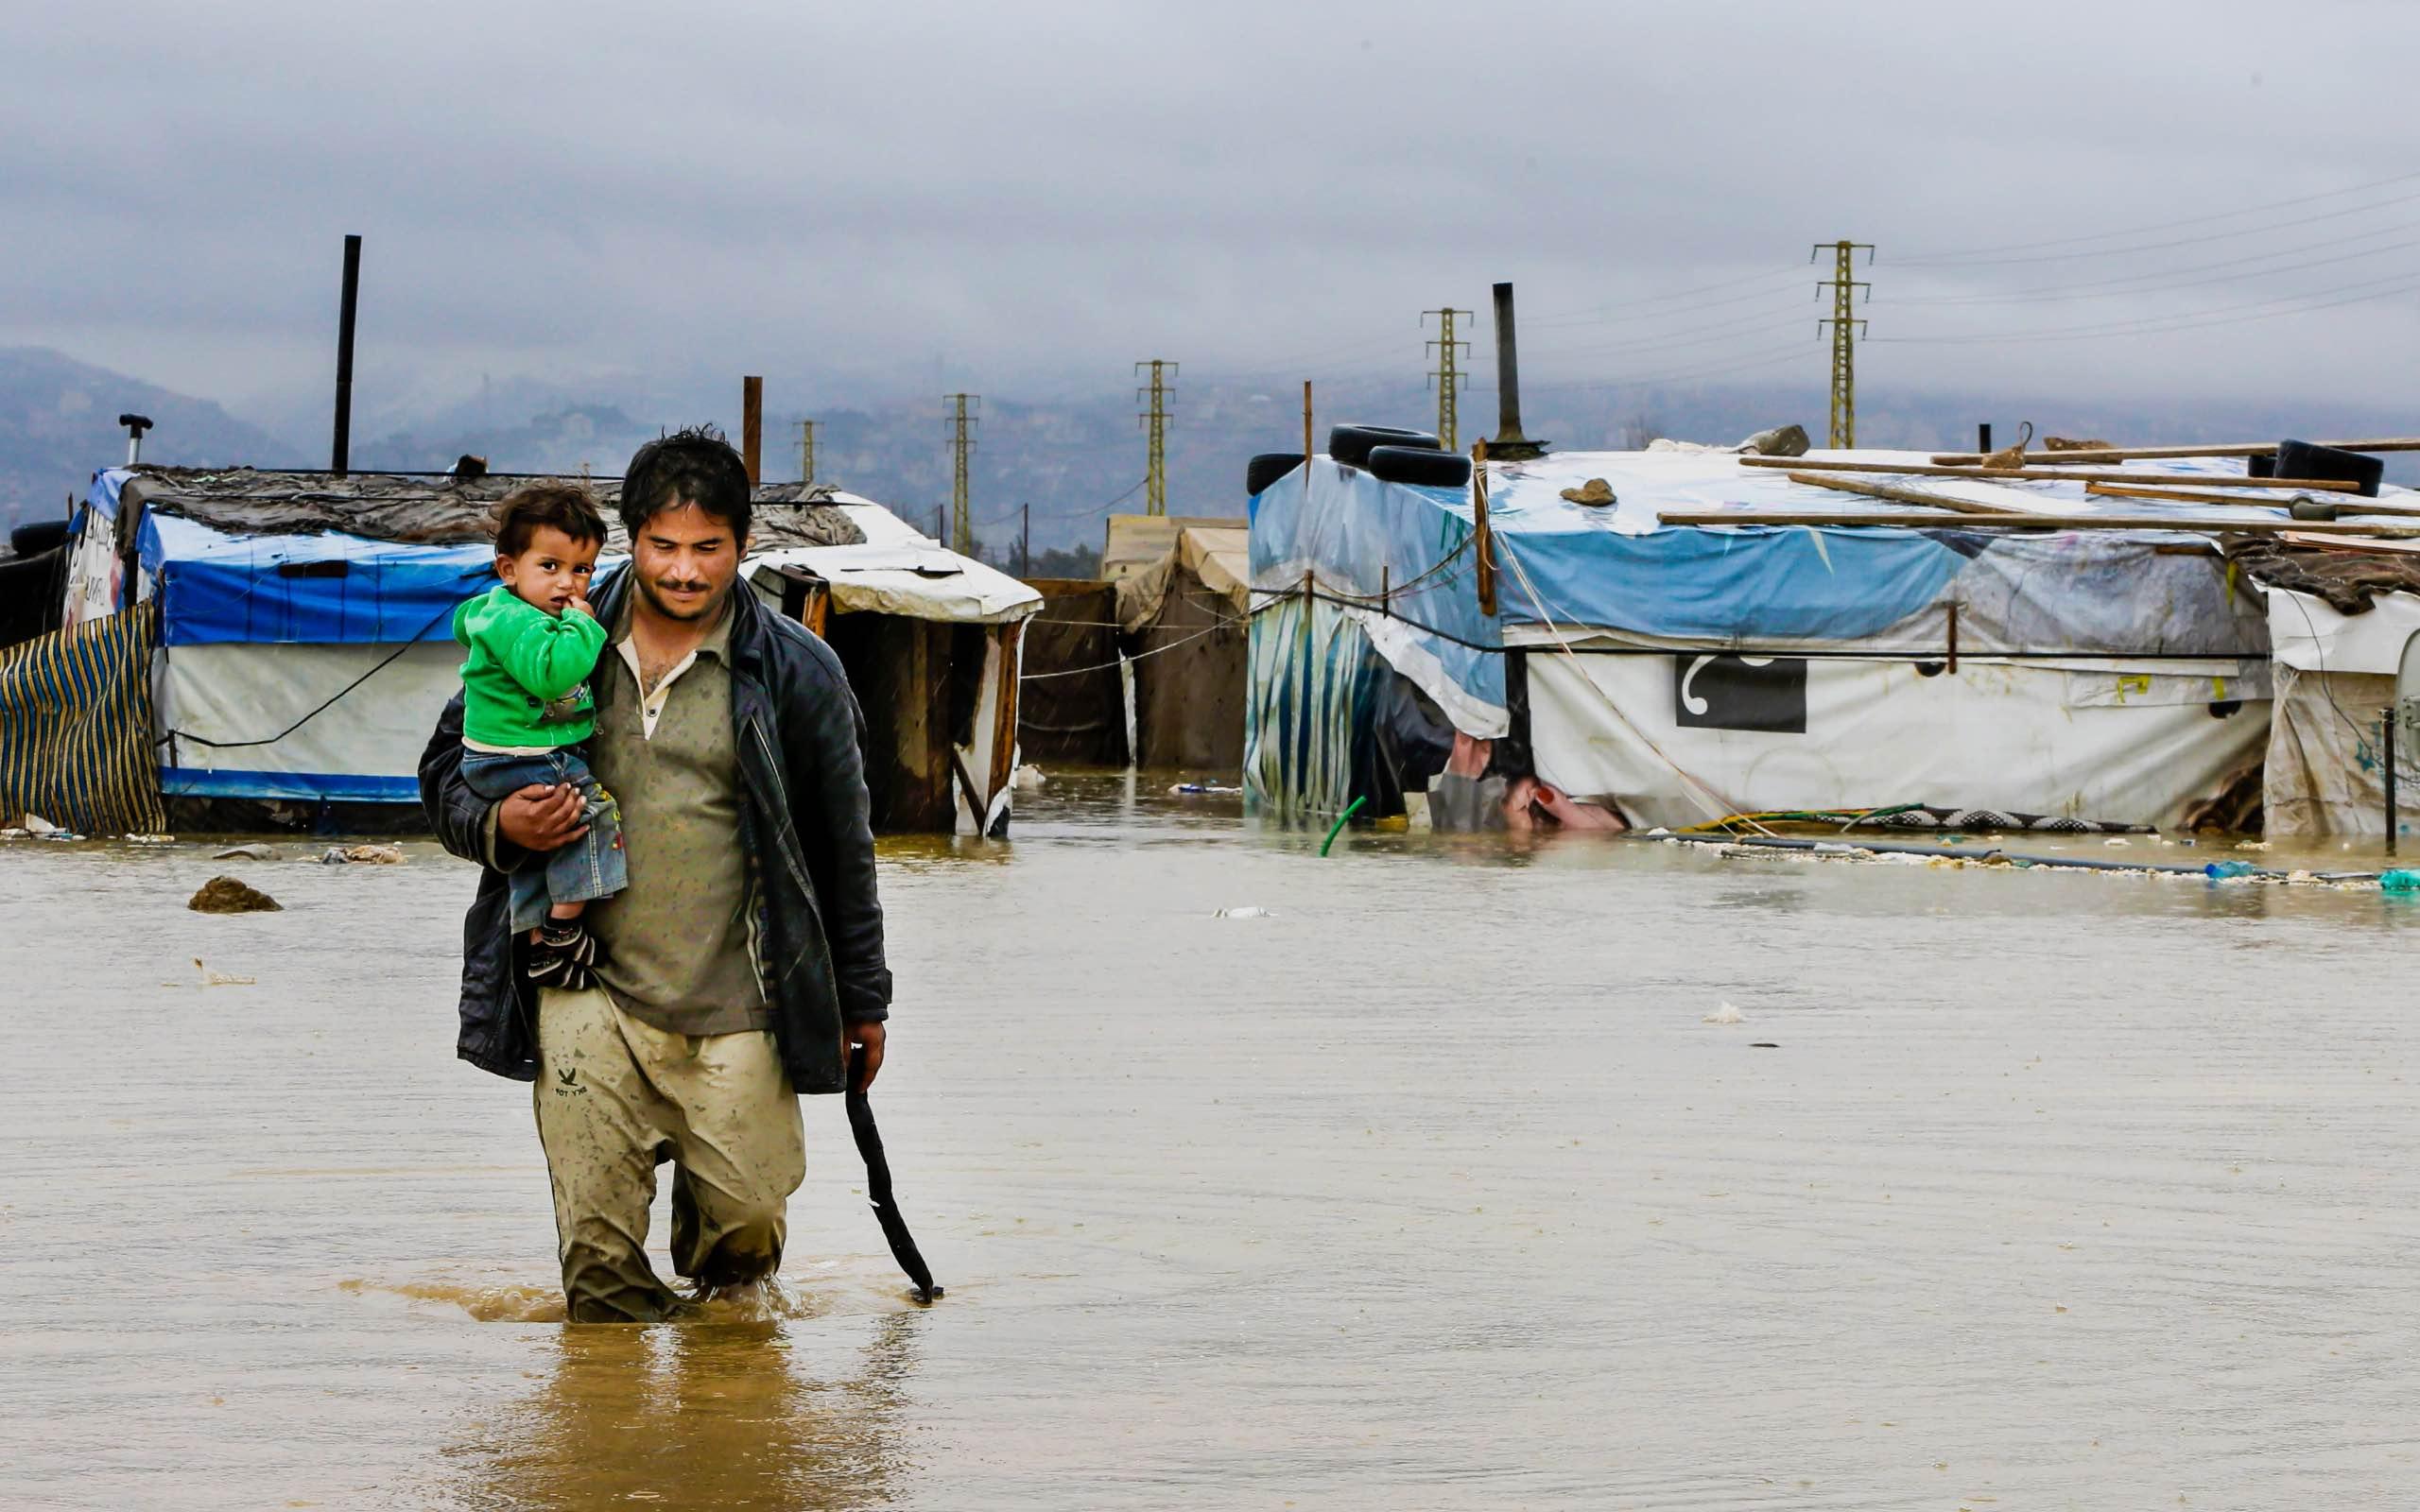 Personas desplazadas a causa de fenómenos climáticos